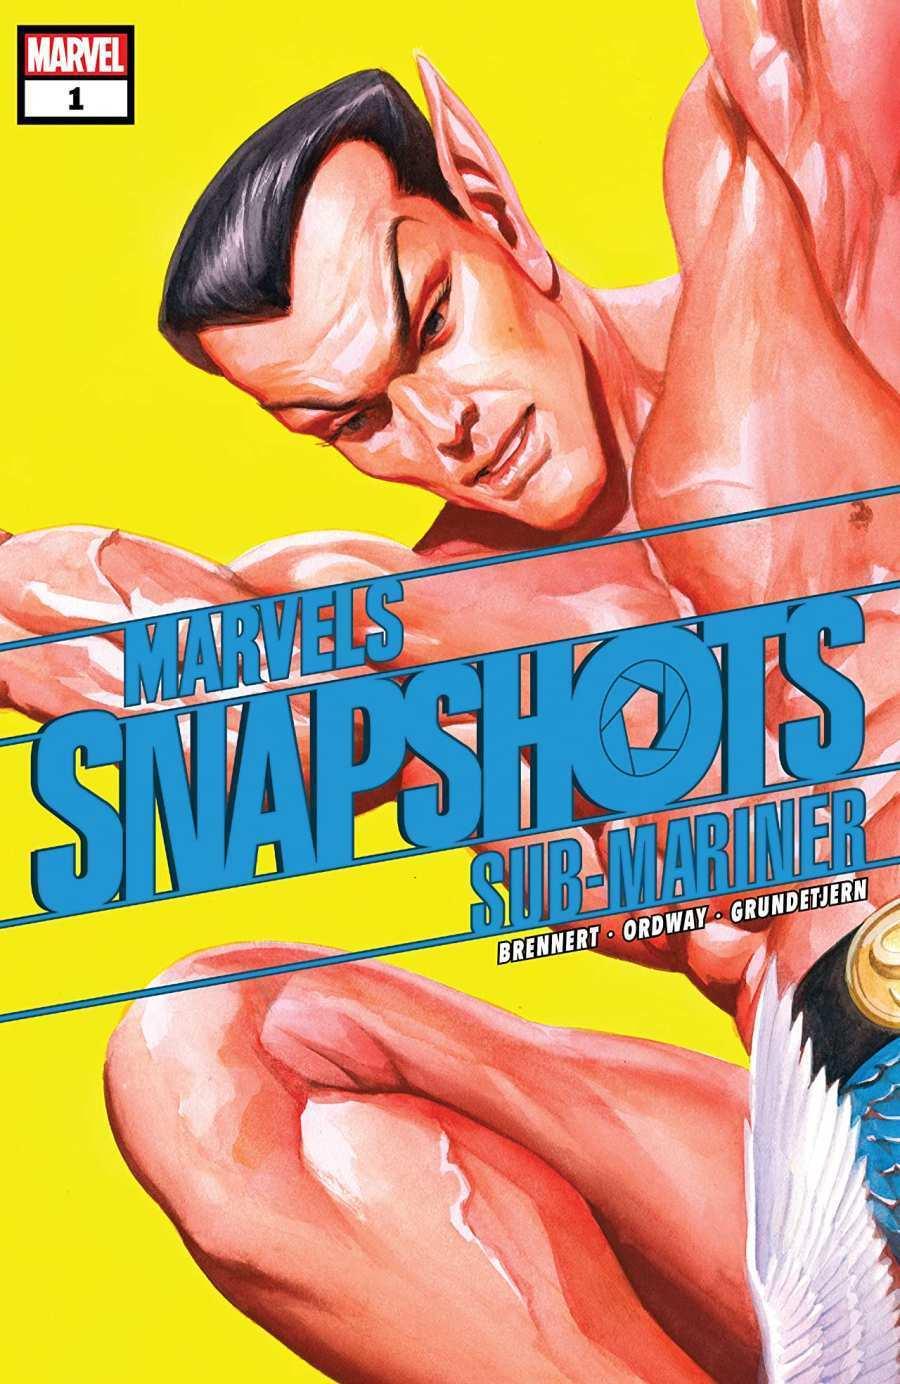 Sub-Mariner Marvels Snapshots